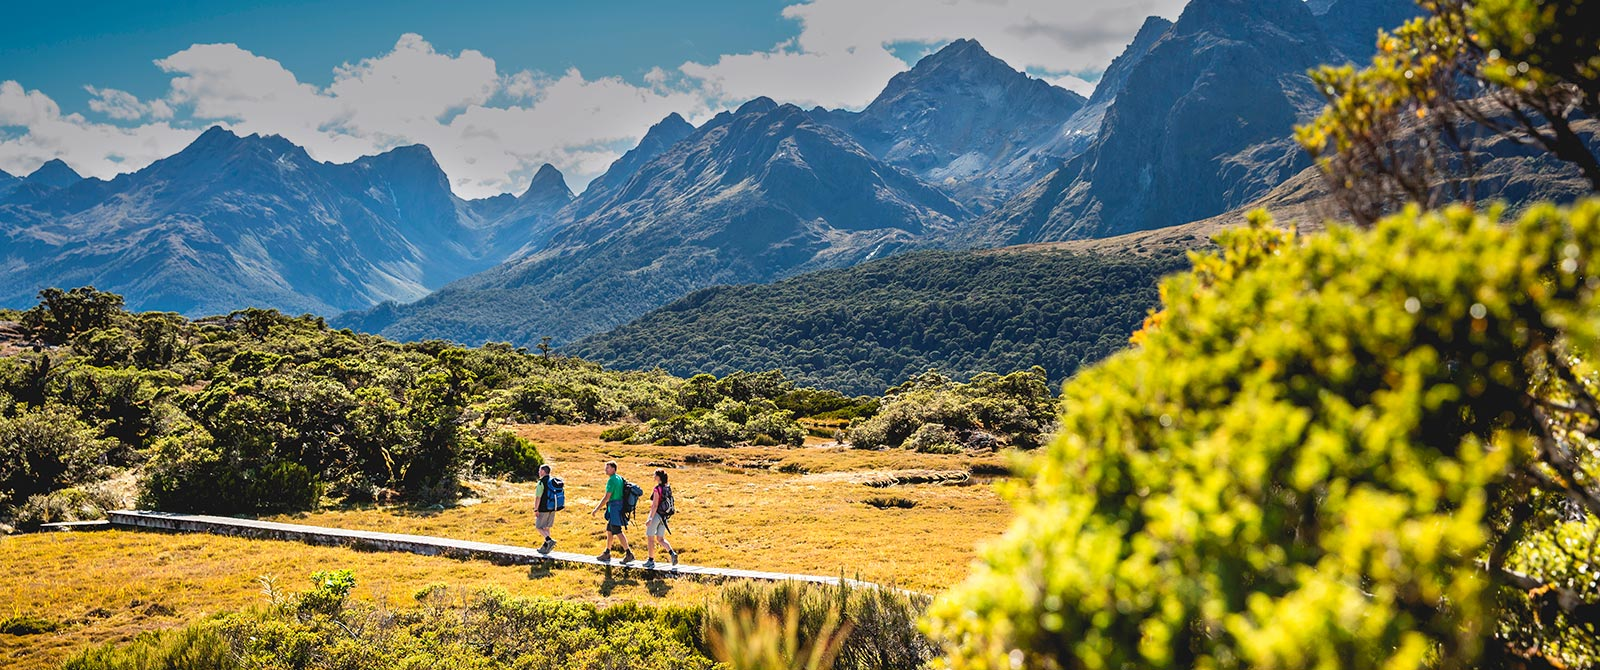 Luxury New Zealand Travel Agency